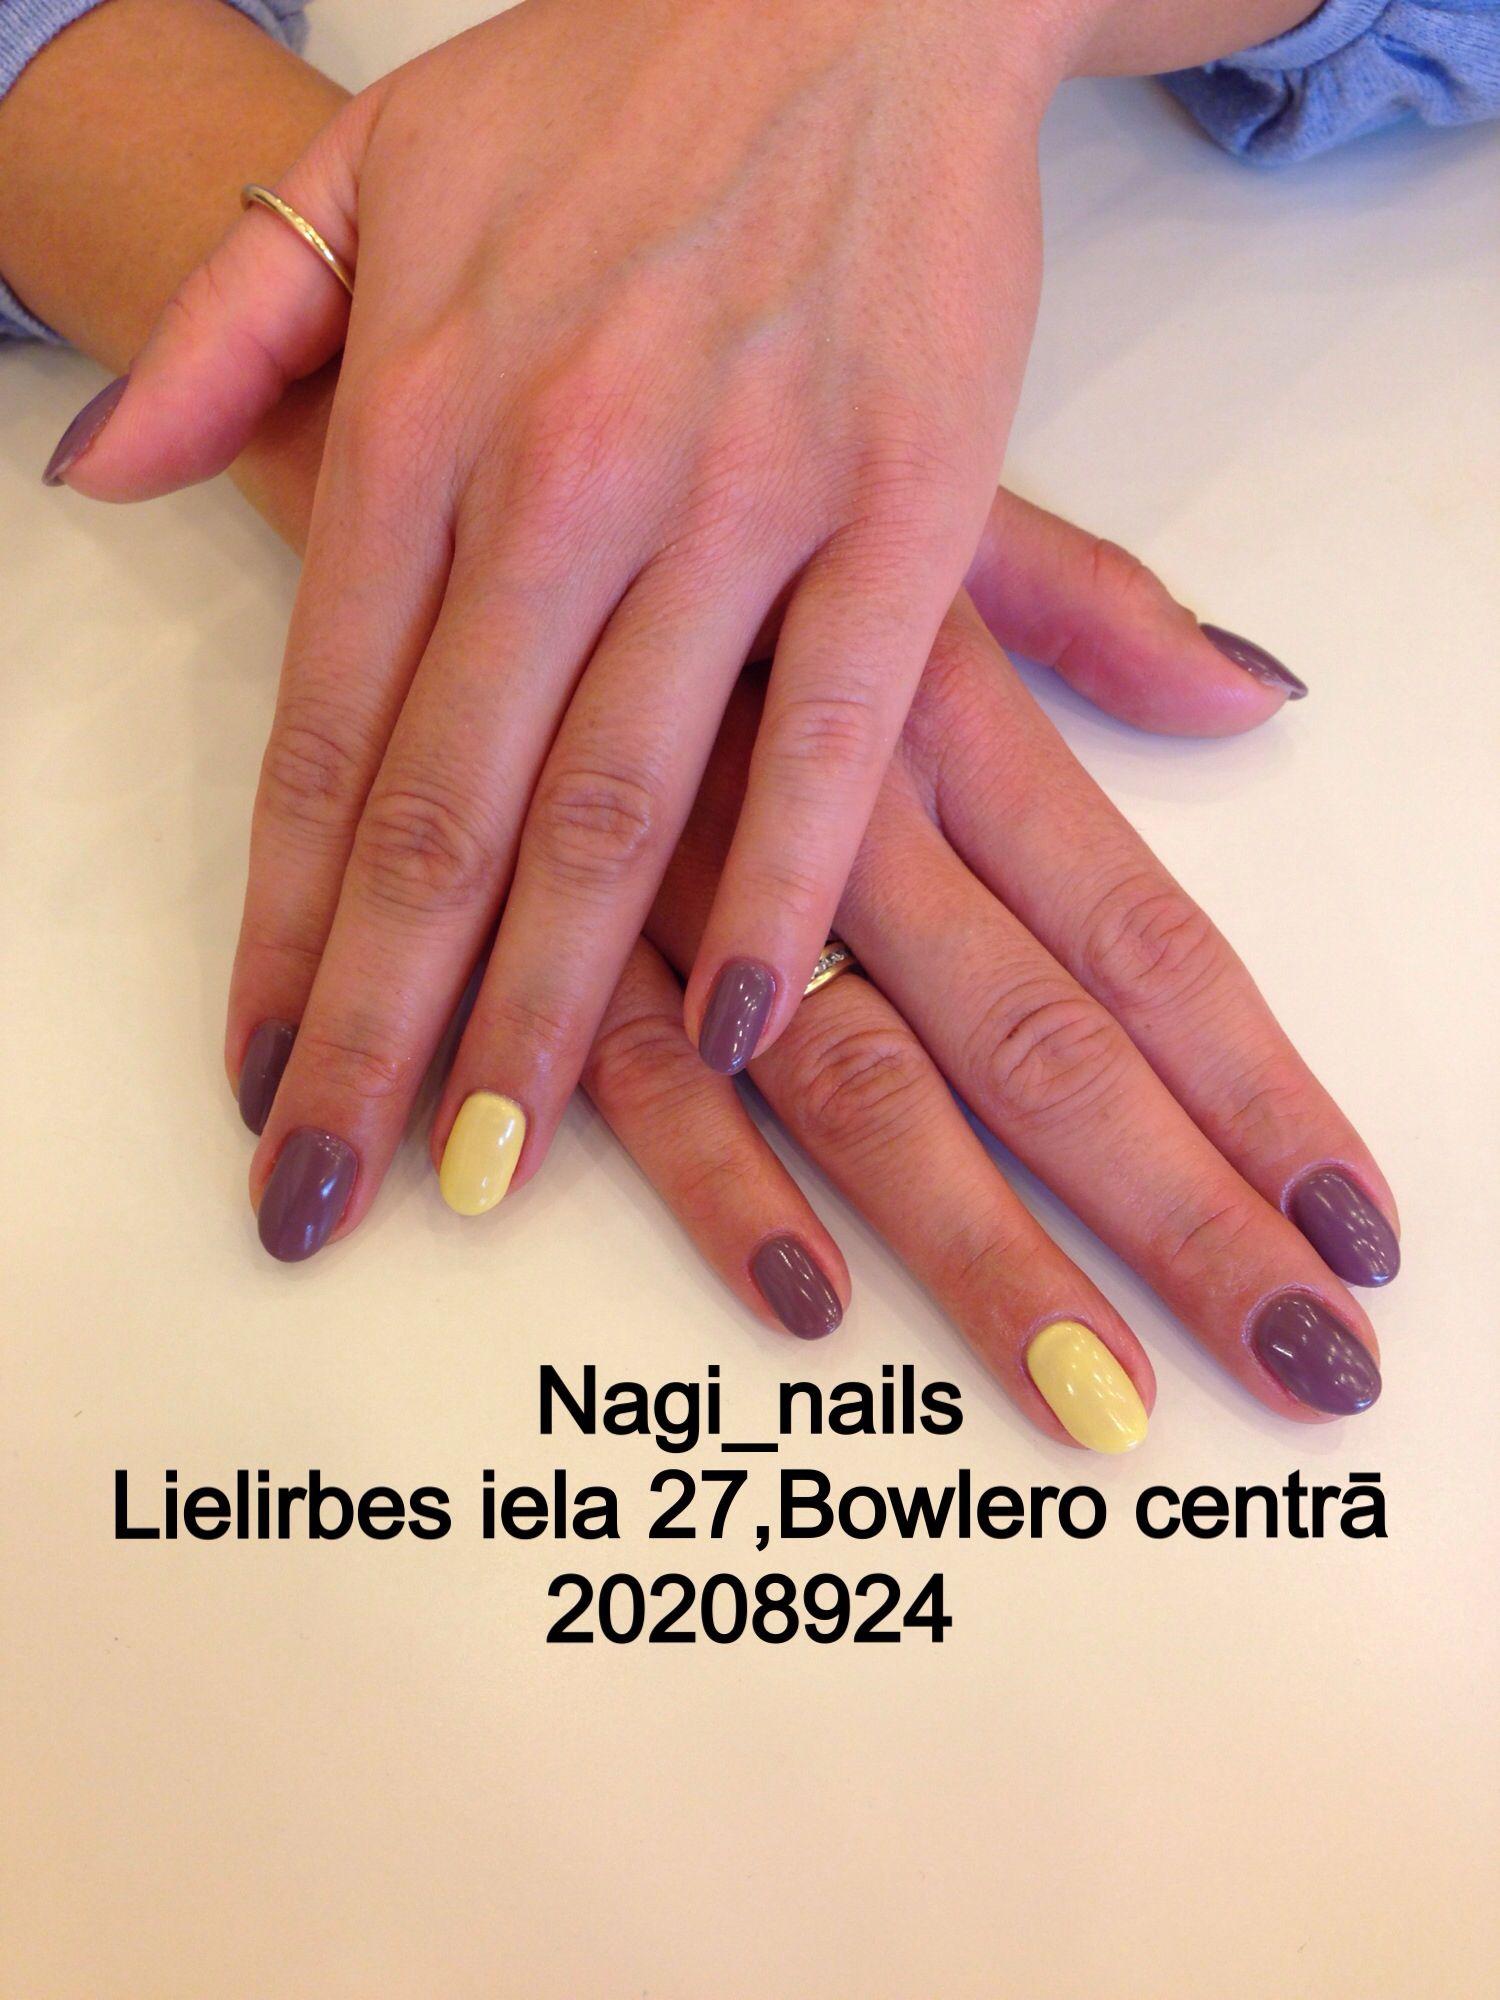 nails#manicure#gel#polish#ibd#gelish#harmony#kinetics# | Nails ...